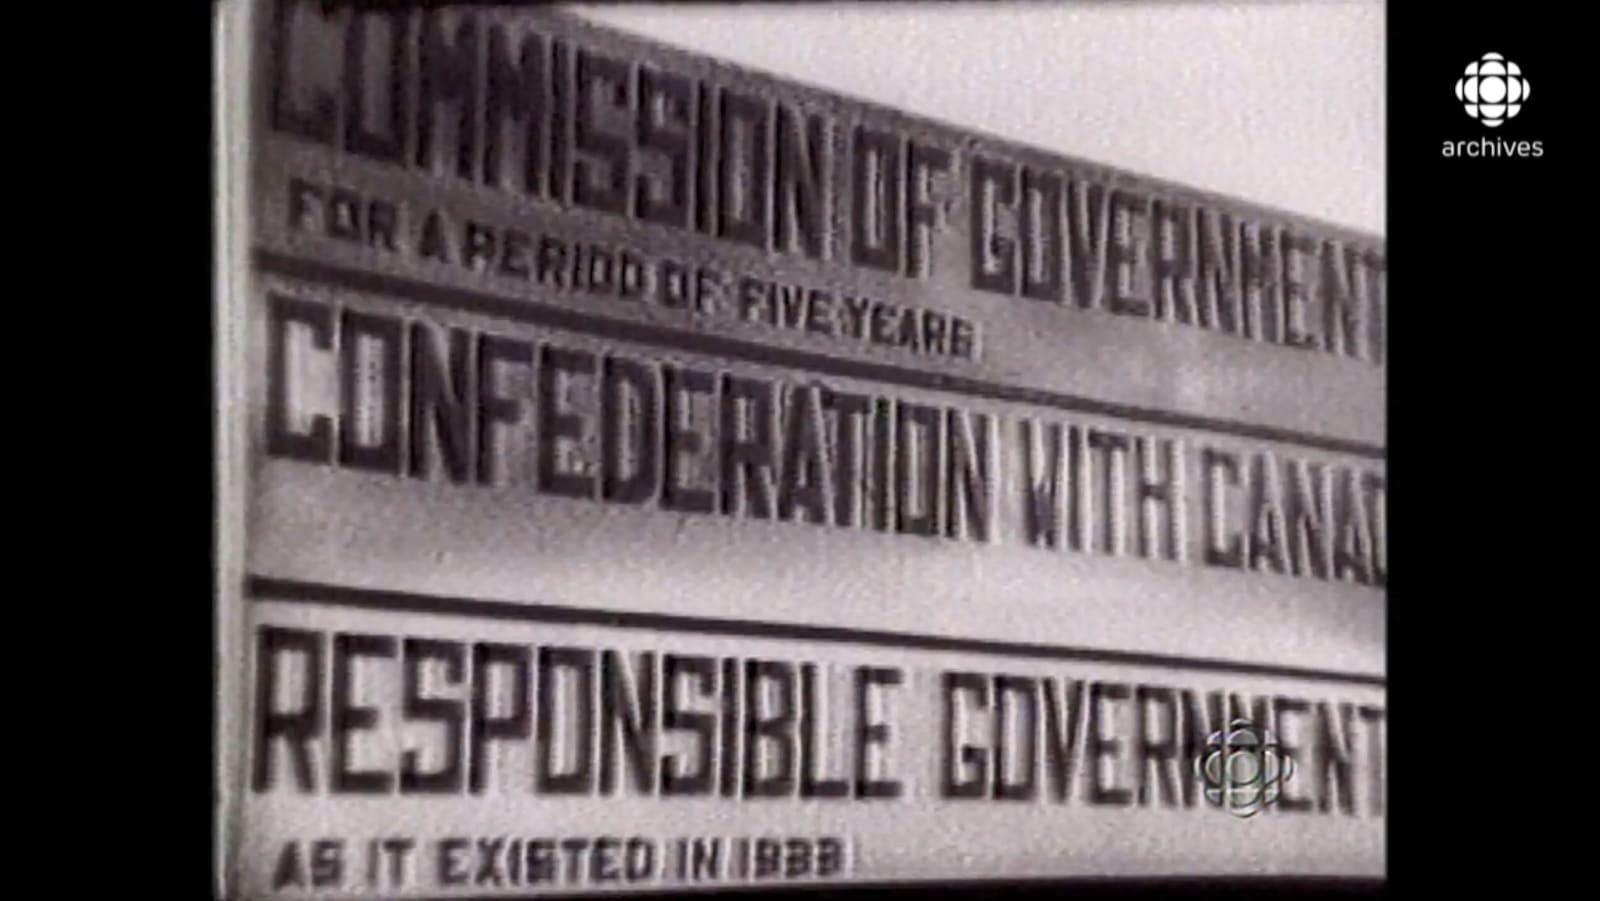 Panneau en anglais présentant trois options : Commission of government, Confederation with Canada, Responsible Government.